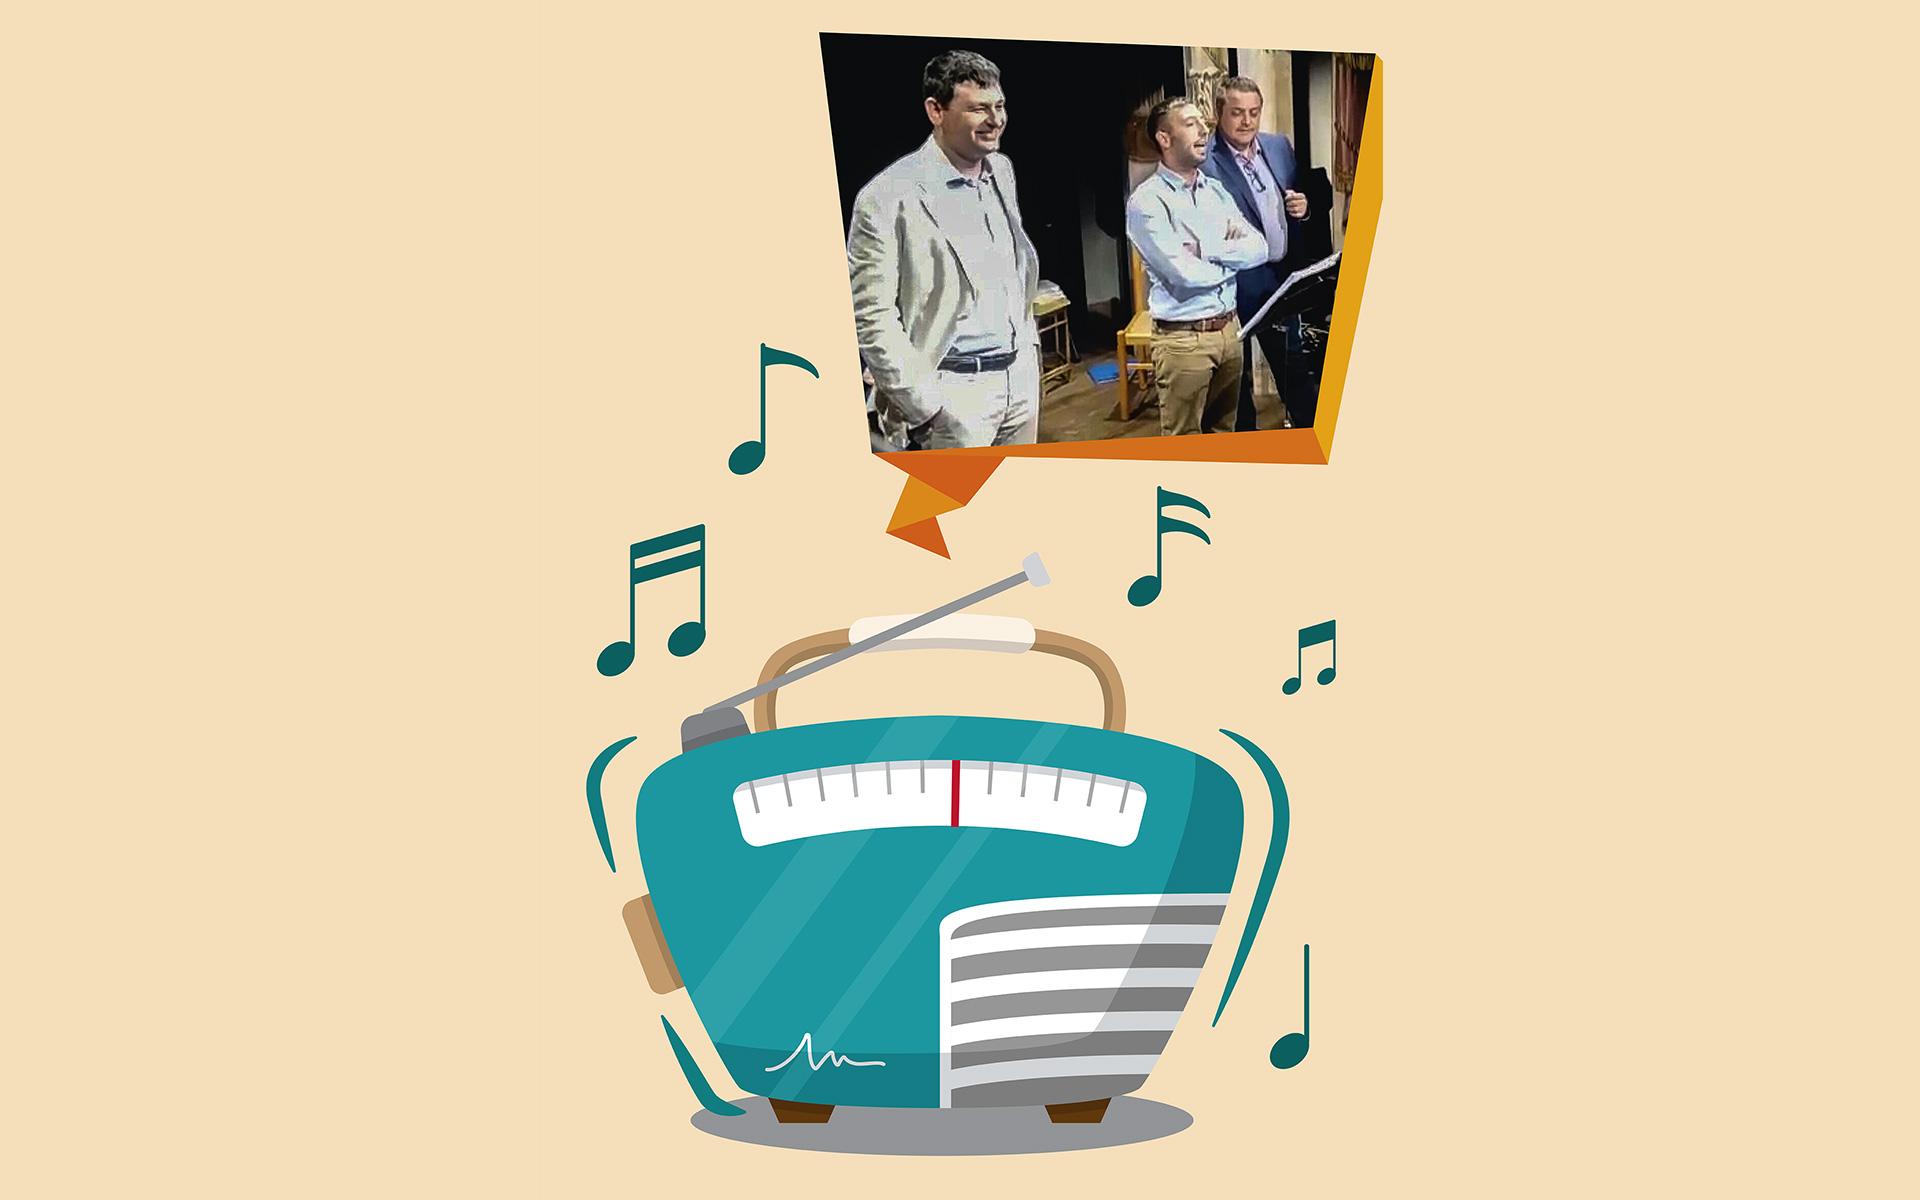 vernacolo in musica teatro di bo